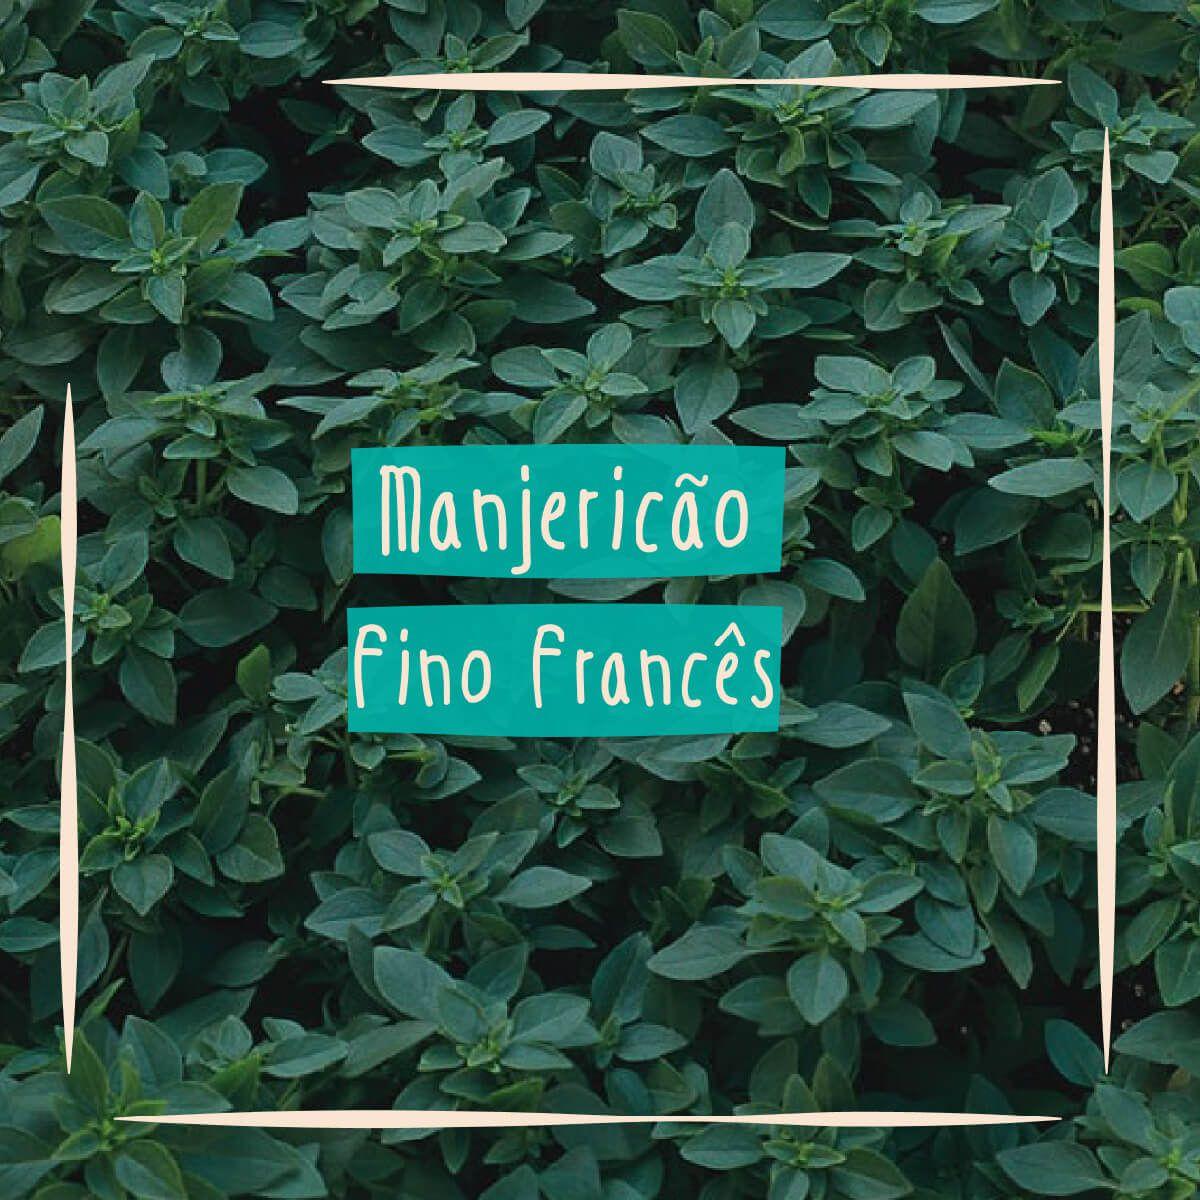 Sementes para plantar Manjericão Fino Francês em vasos autoirrigáveis RAIZ  - Vasos Raiz Loja Oficial